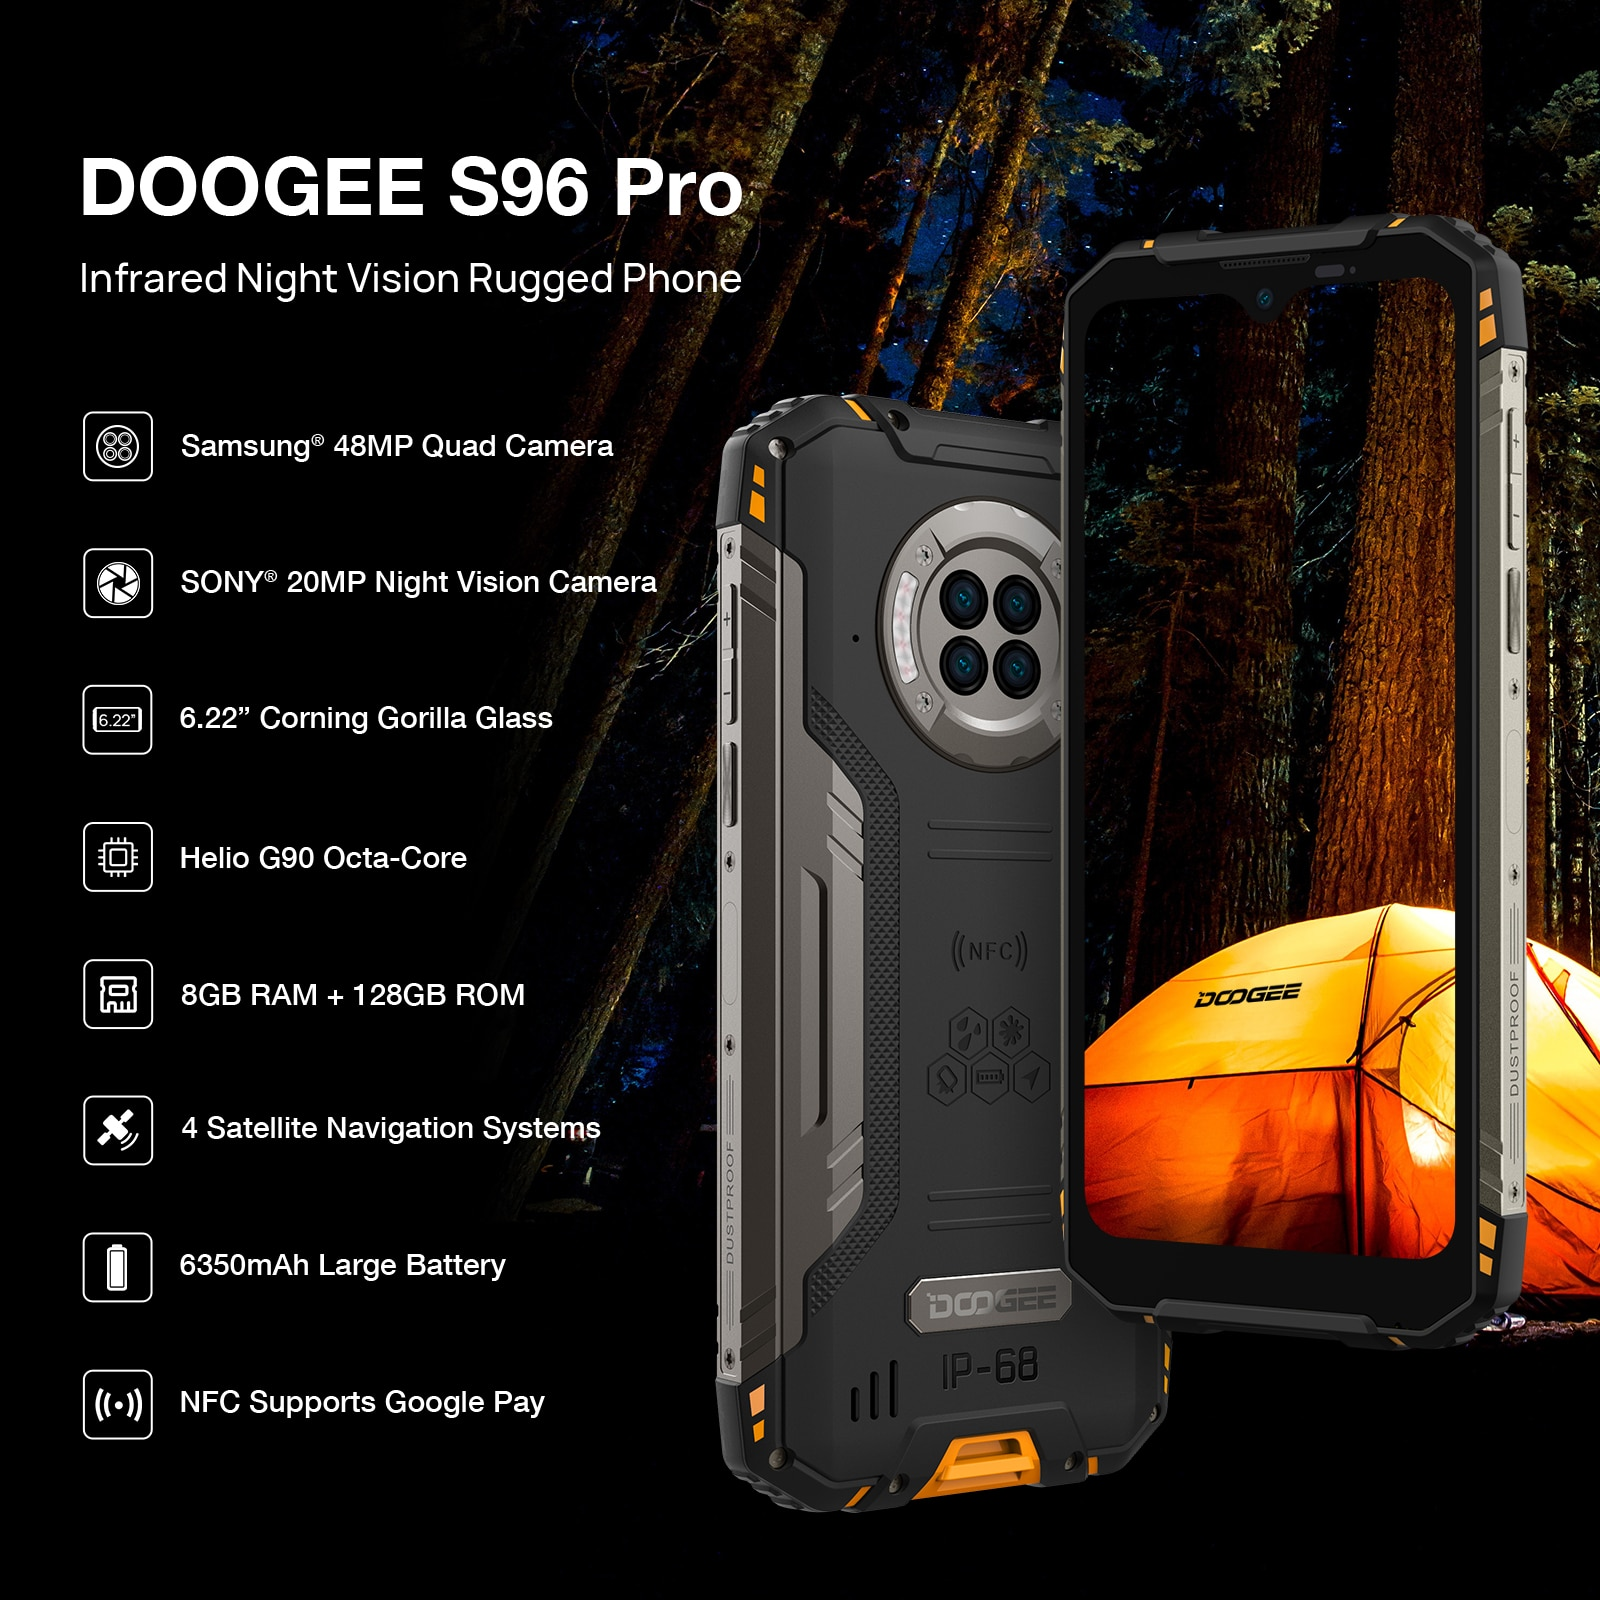 DOOGEE S96 Pro mobile phone Smartphone 48MP Round Quad Camera 20MP Infrared Night Vision Helio G90 Octa Core 8GB+128GB 6350mAh enlarge